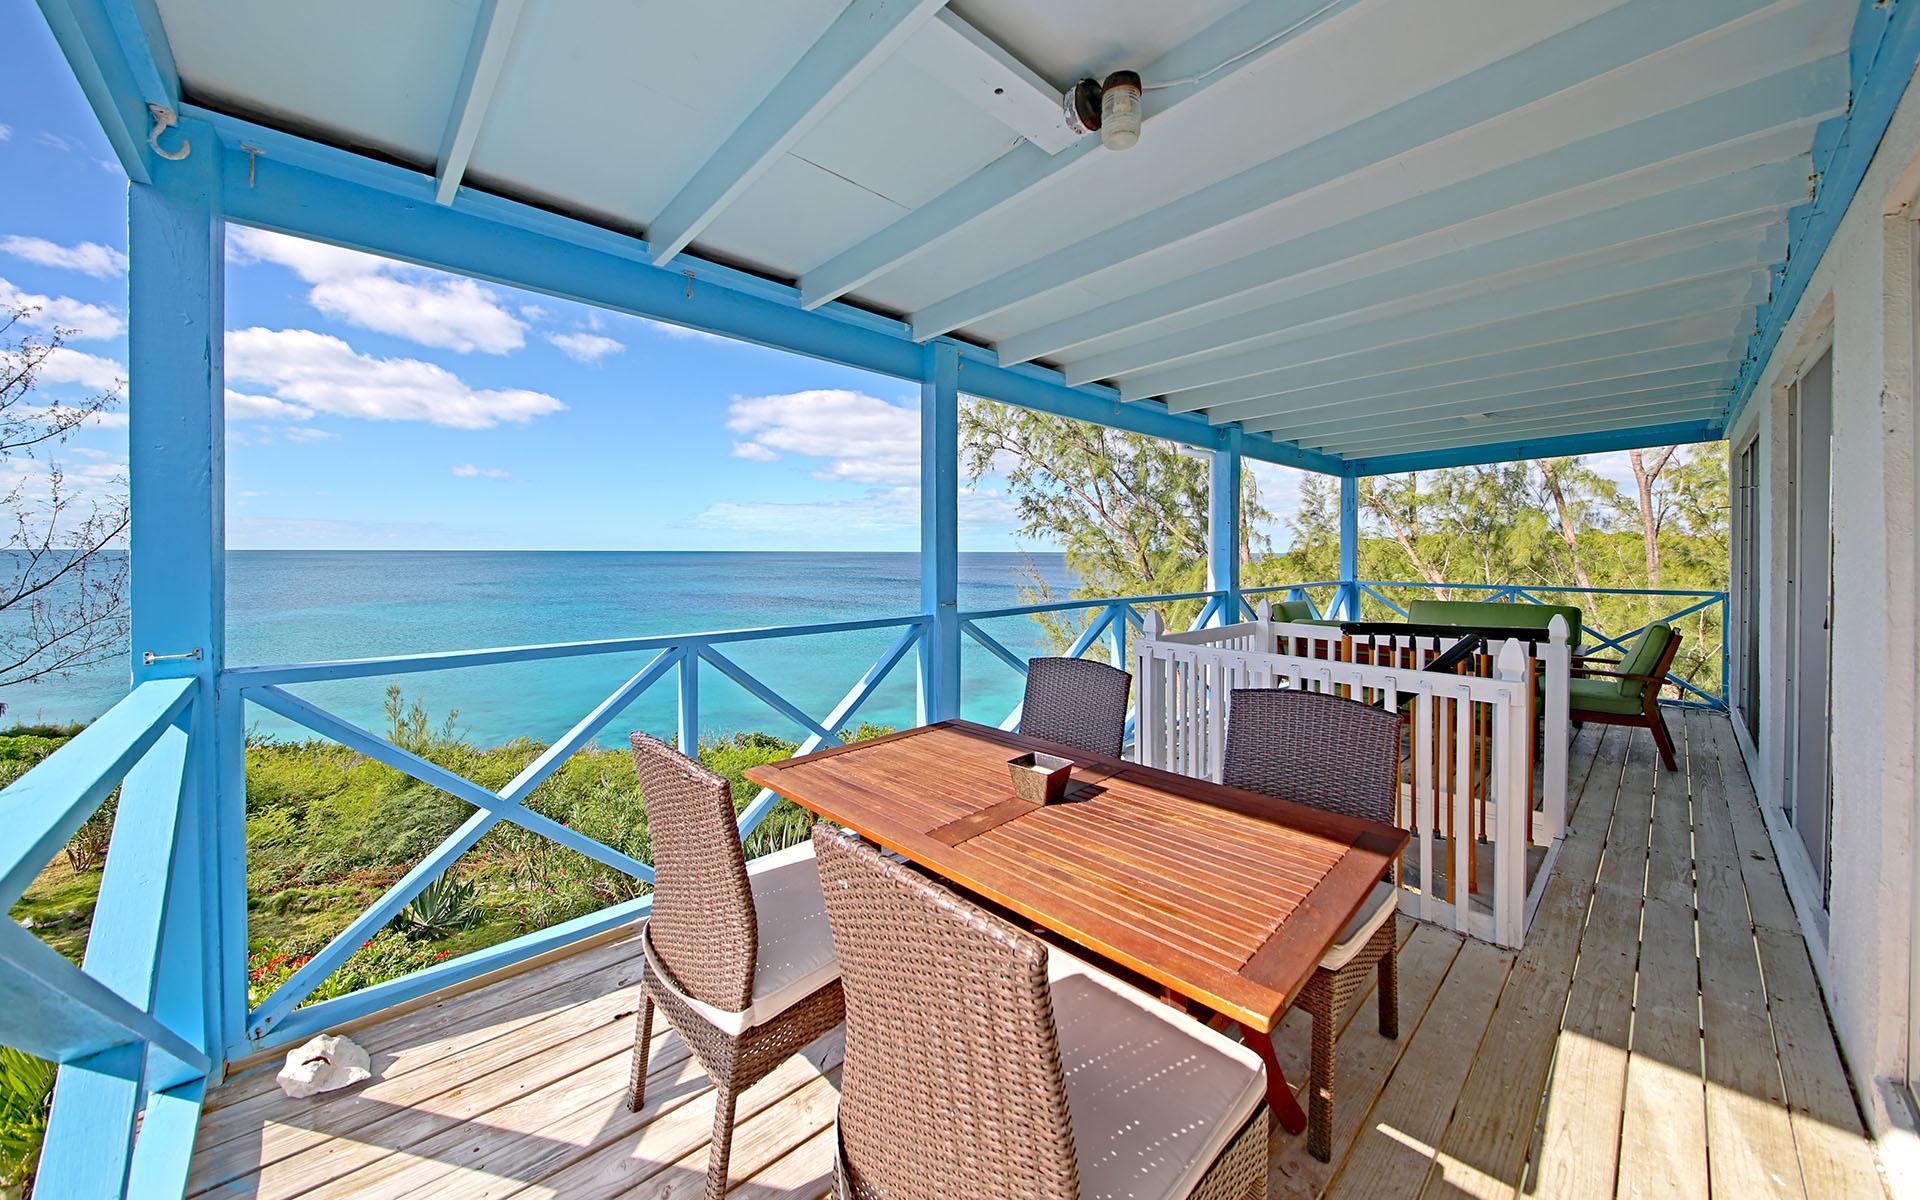 Additional photo for property listing at Tropical Island Waterfront Villa Near Ten Bay Eleuthera / MLS 28729 Savannah Sound, Eleuthera, Bahamas